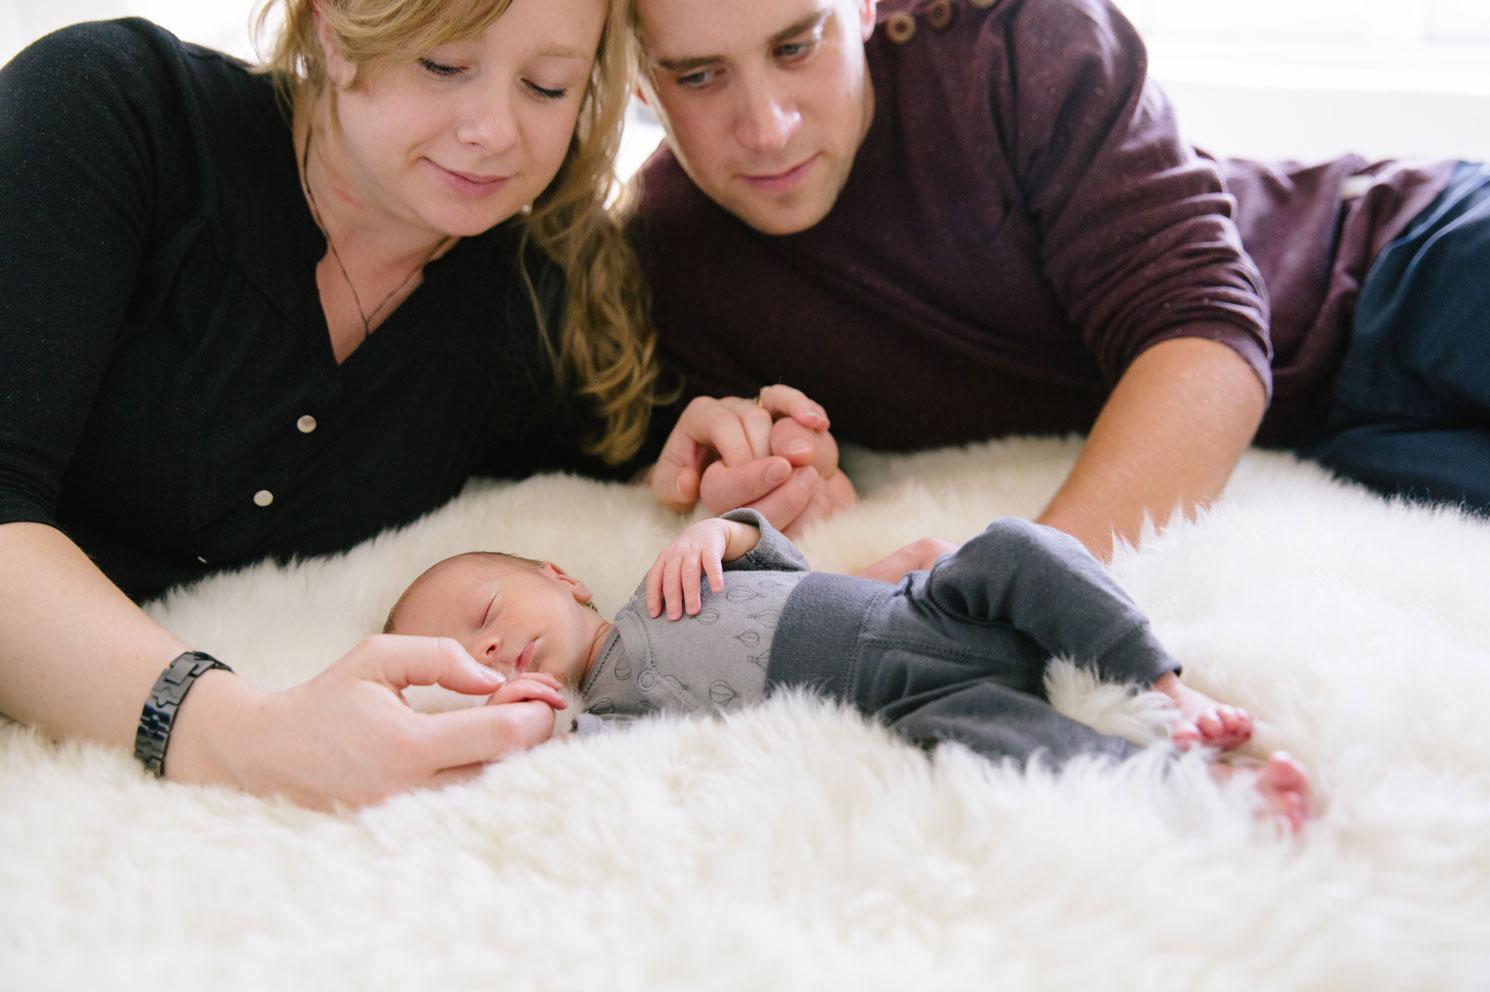 first-moments-beloved-moment-design-nyfoddfotografering-i-hemmiljo-nyfodd-maria-o-photo-baby